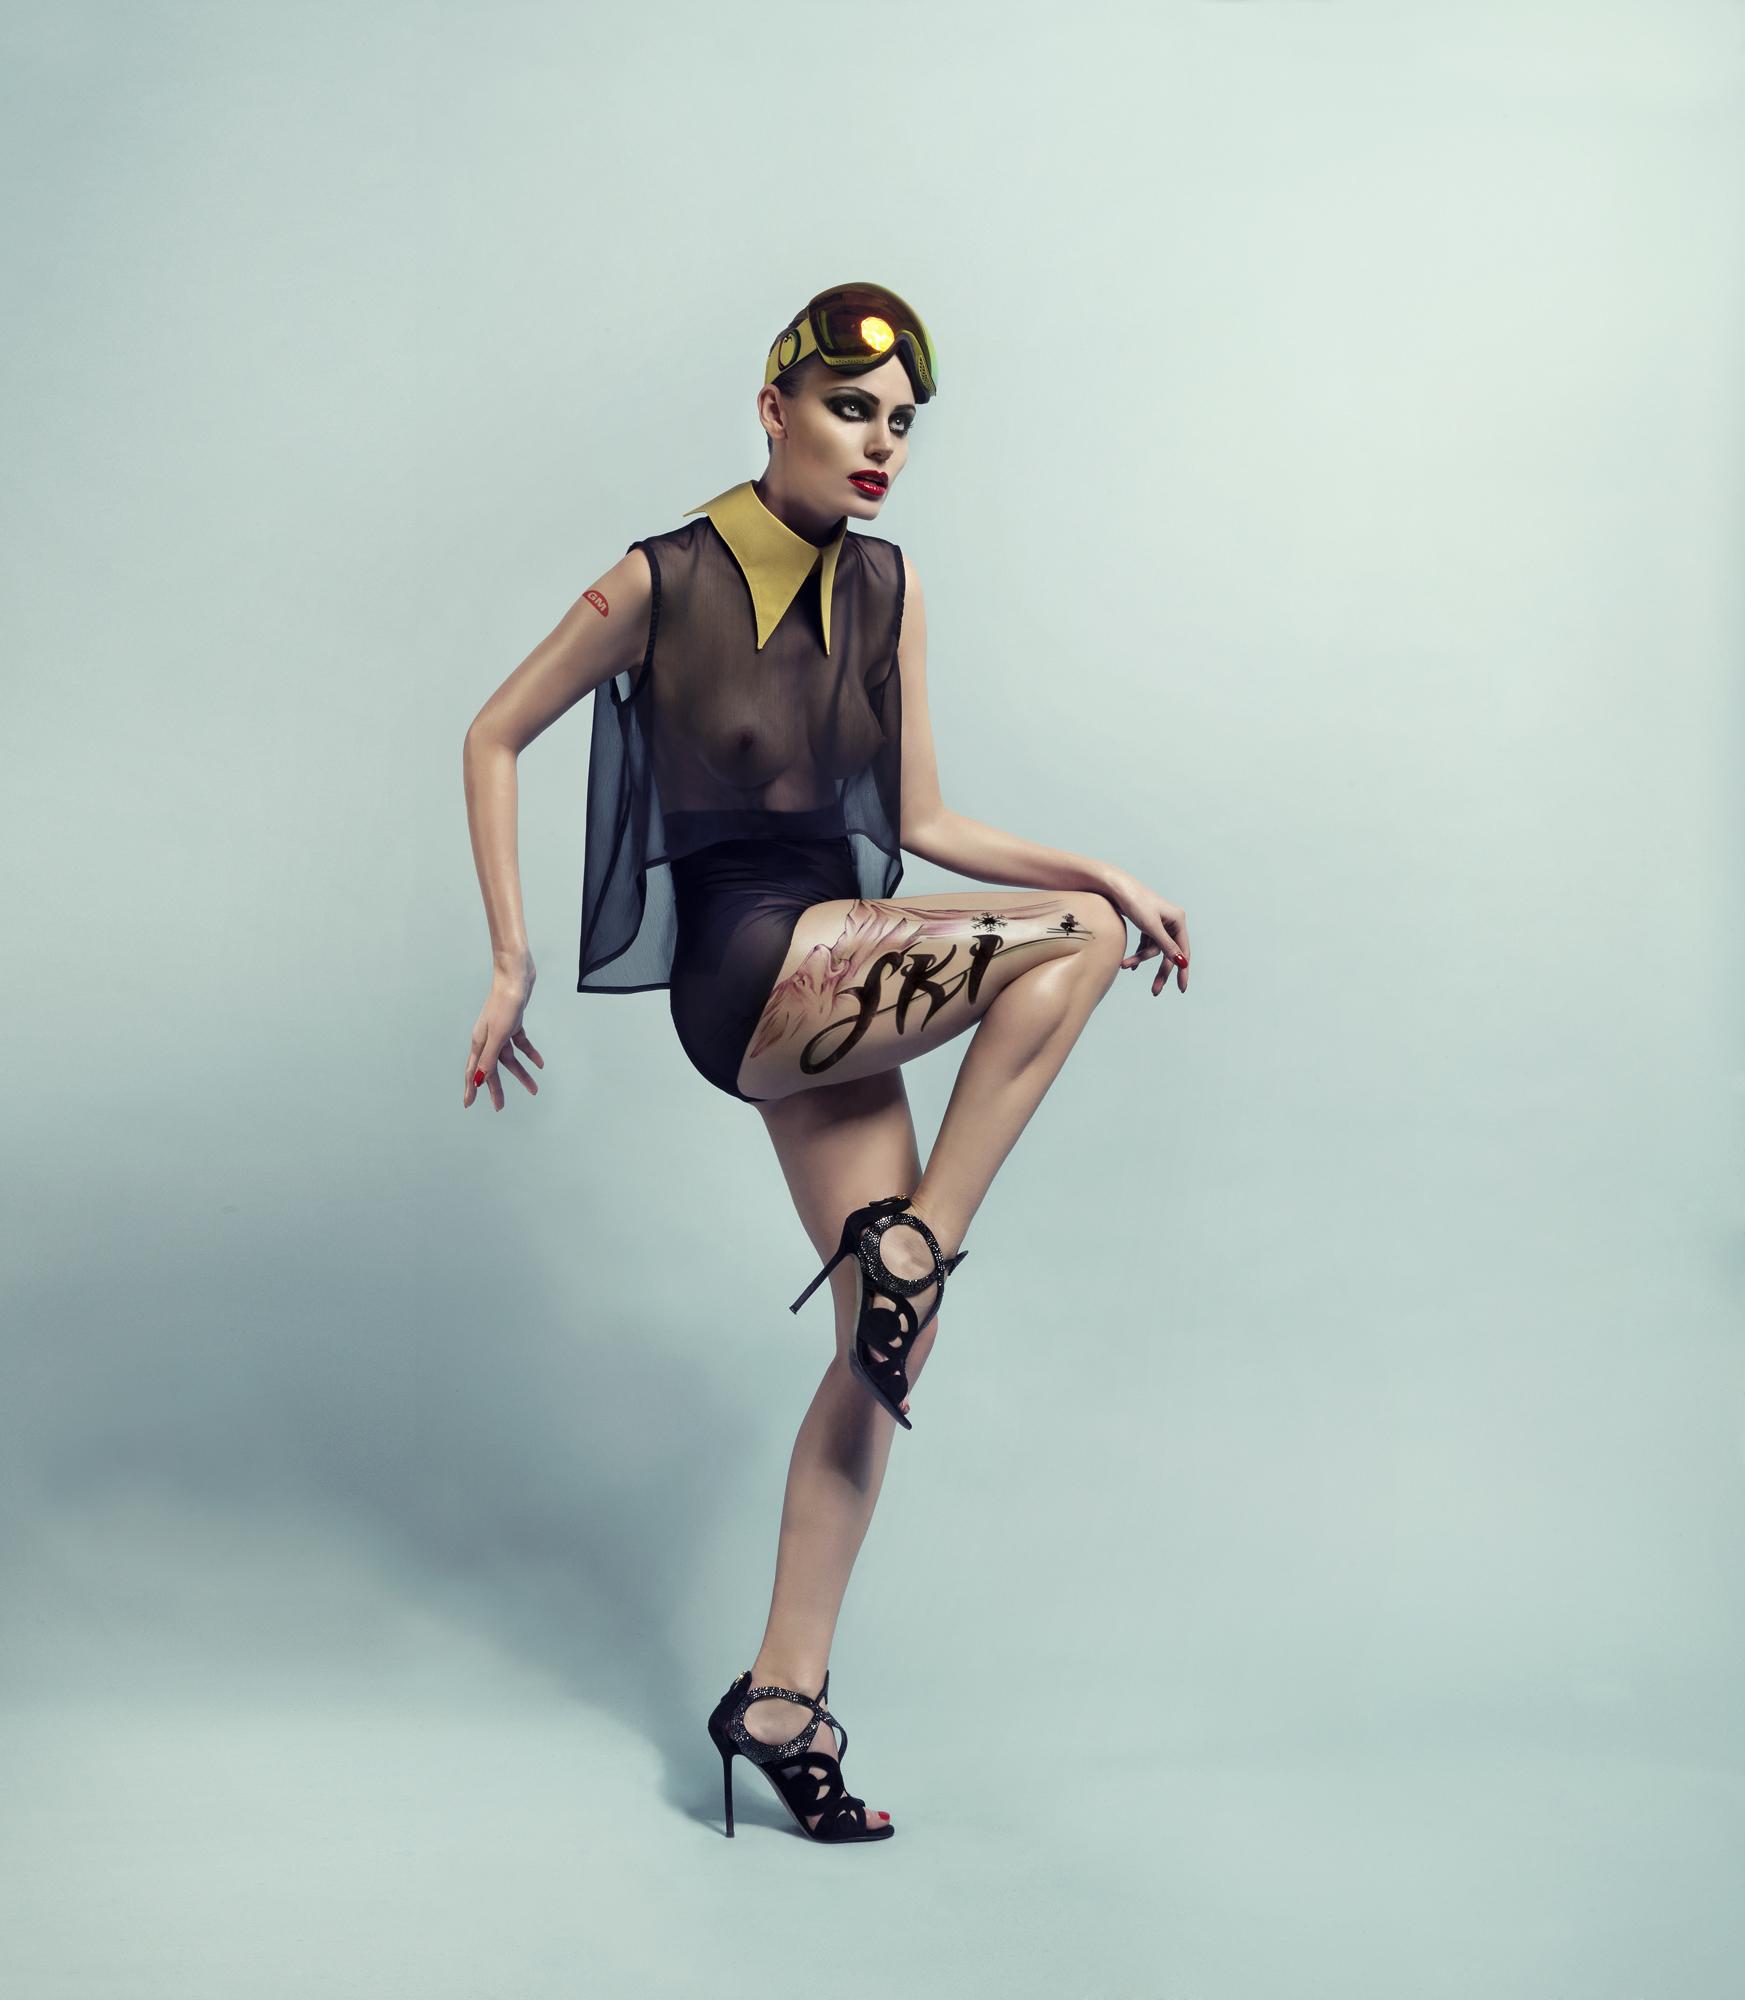 fashion sport 02